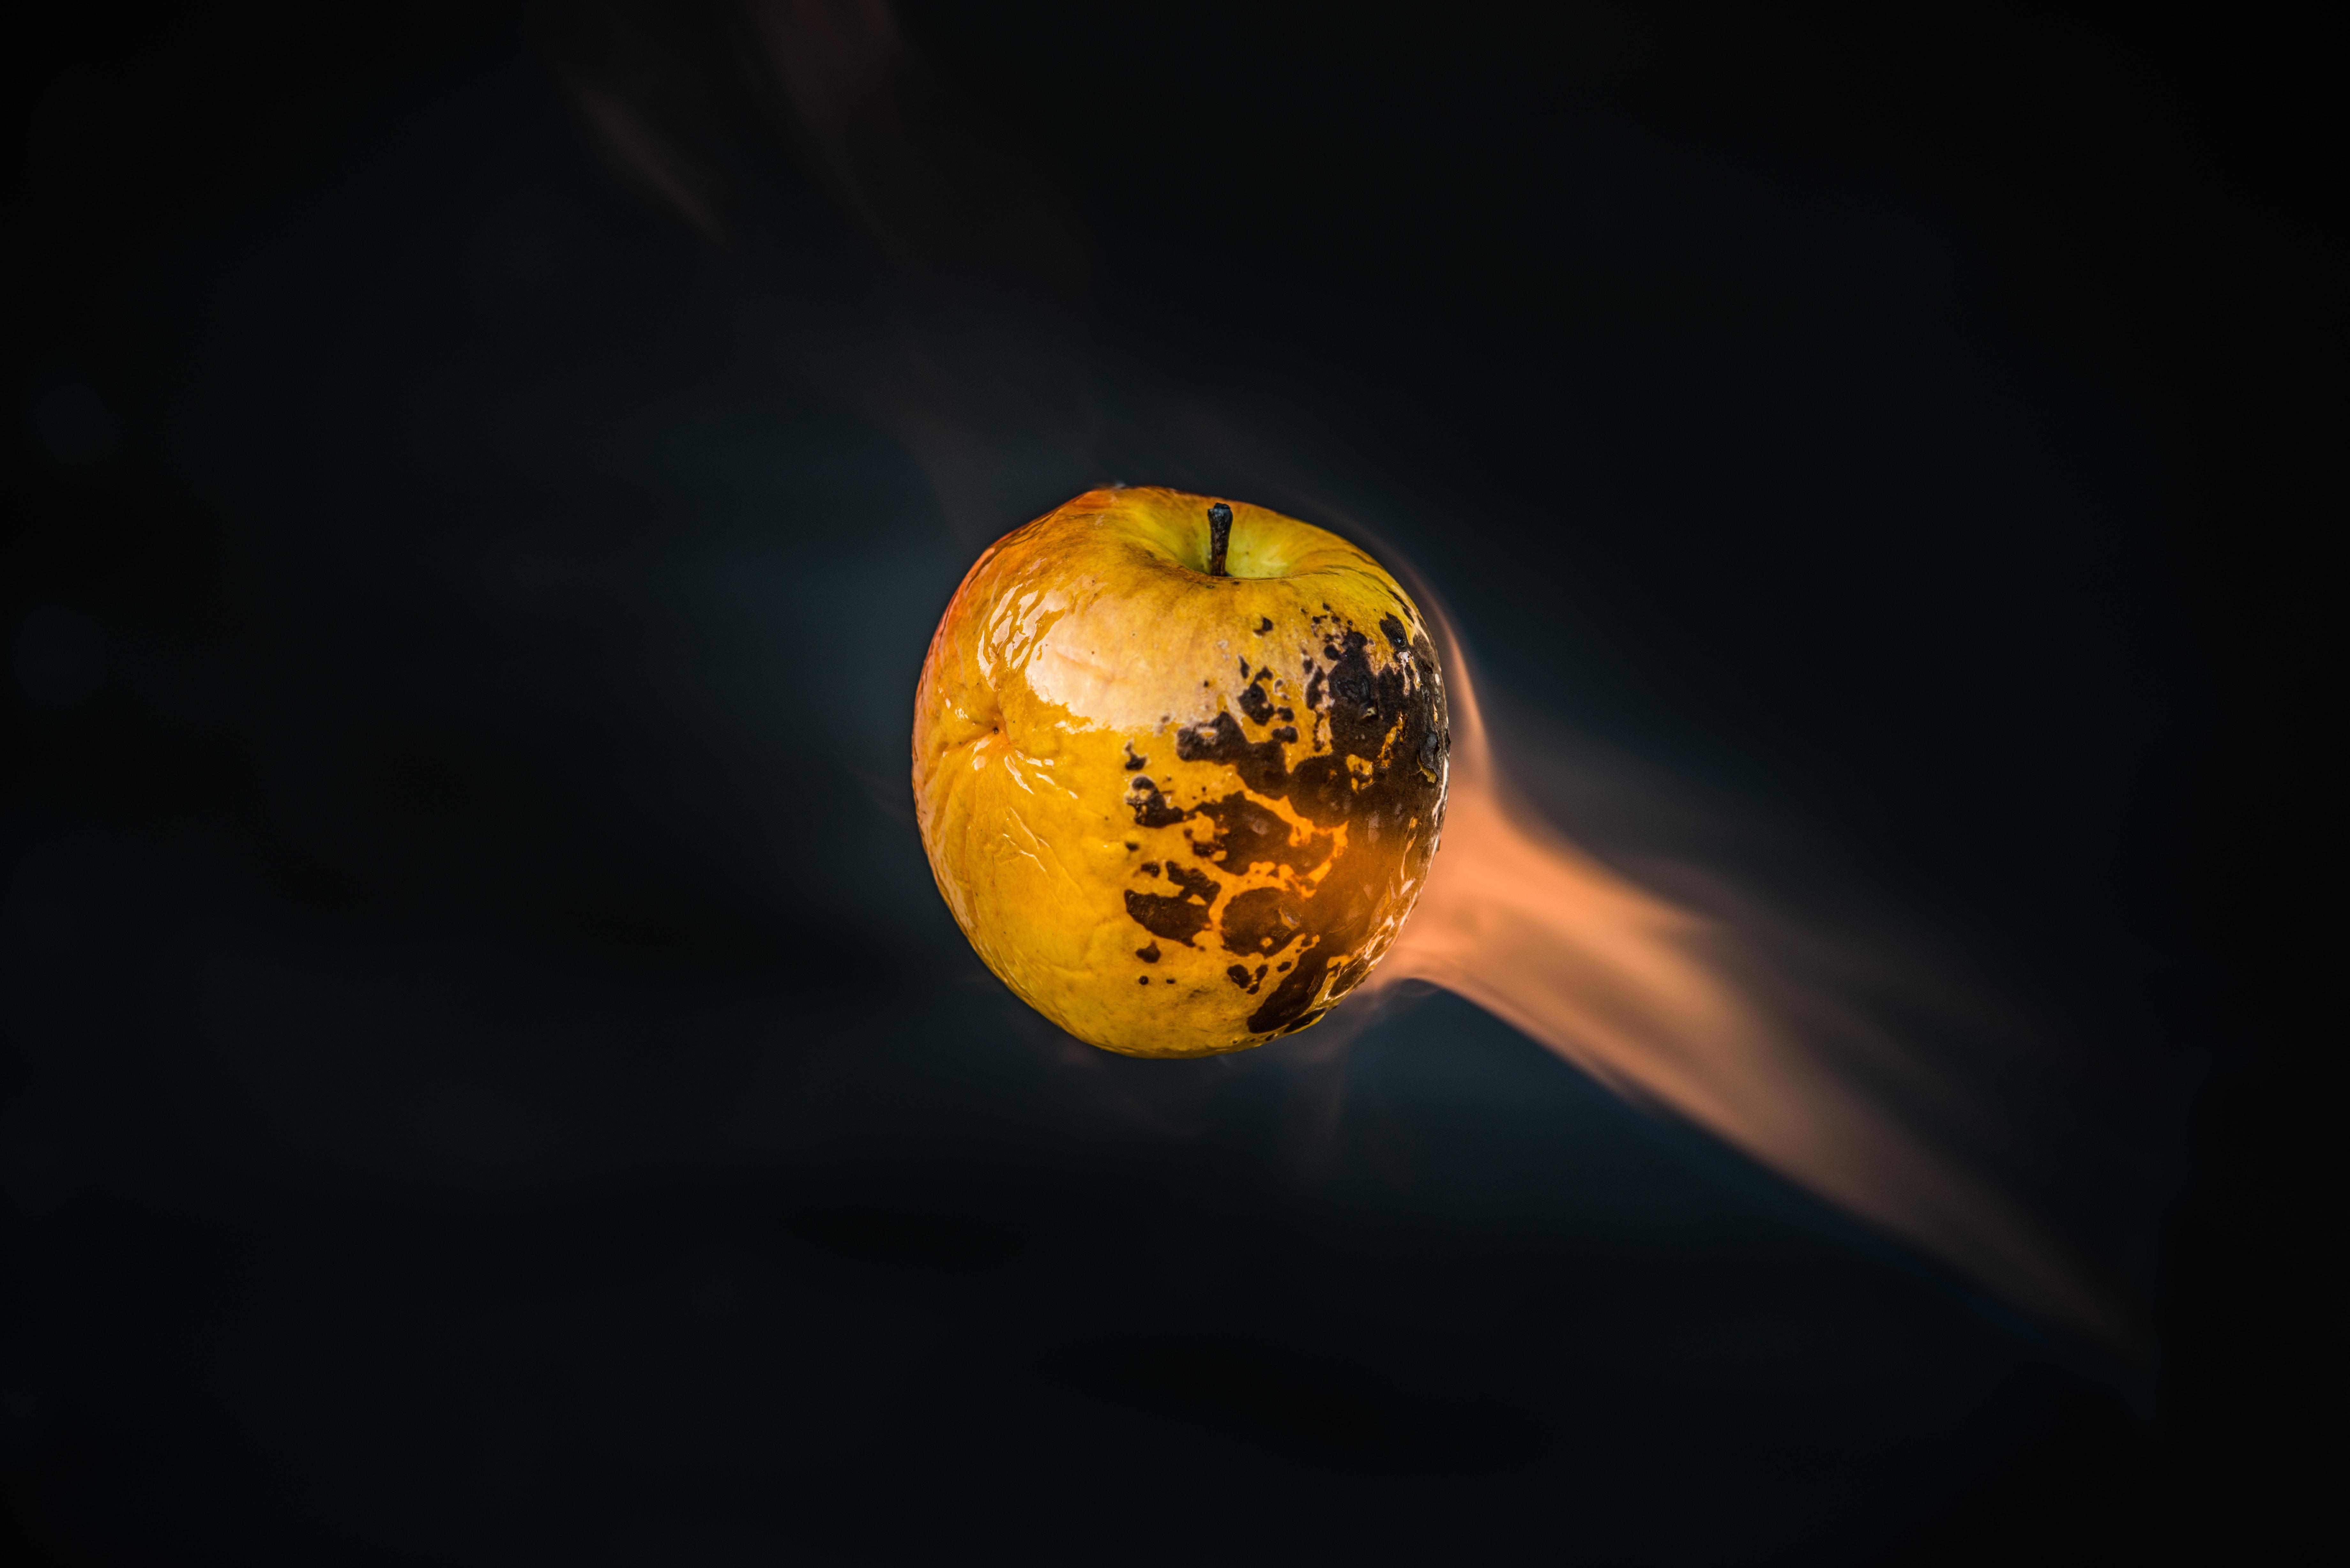 flame apple fruit